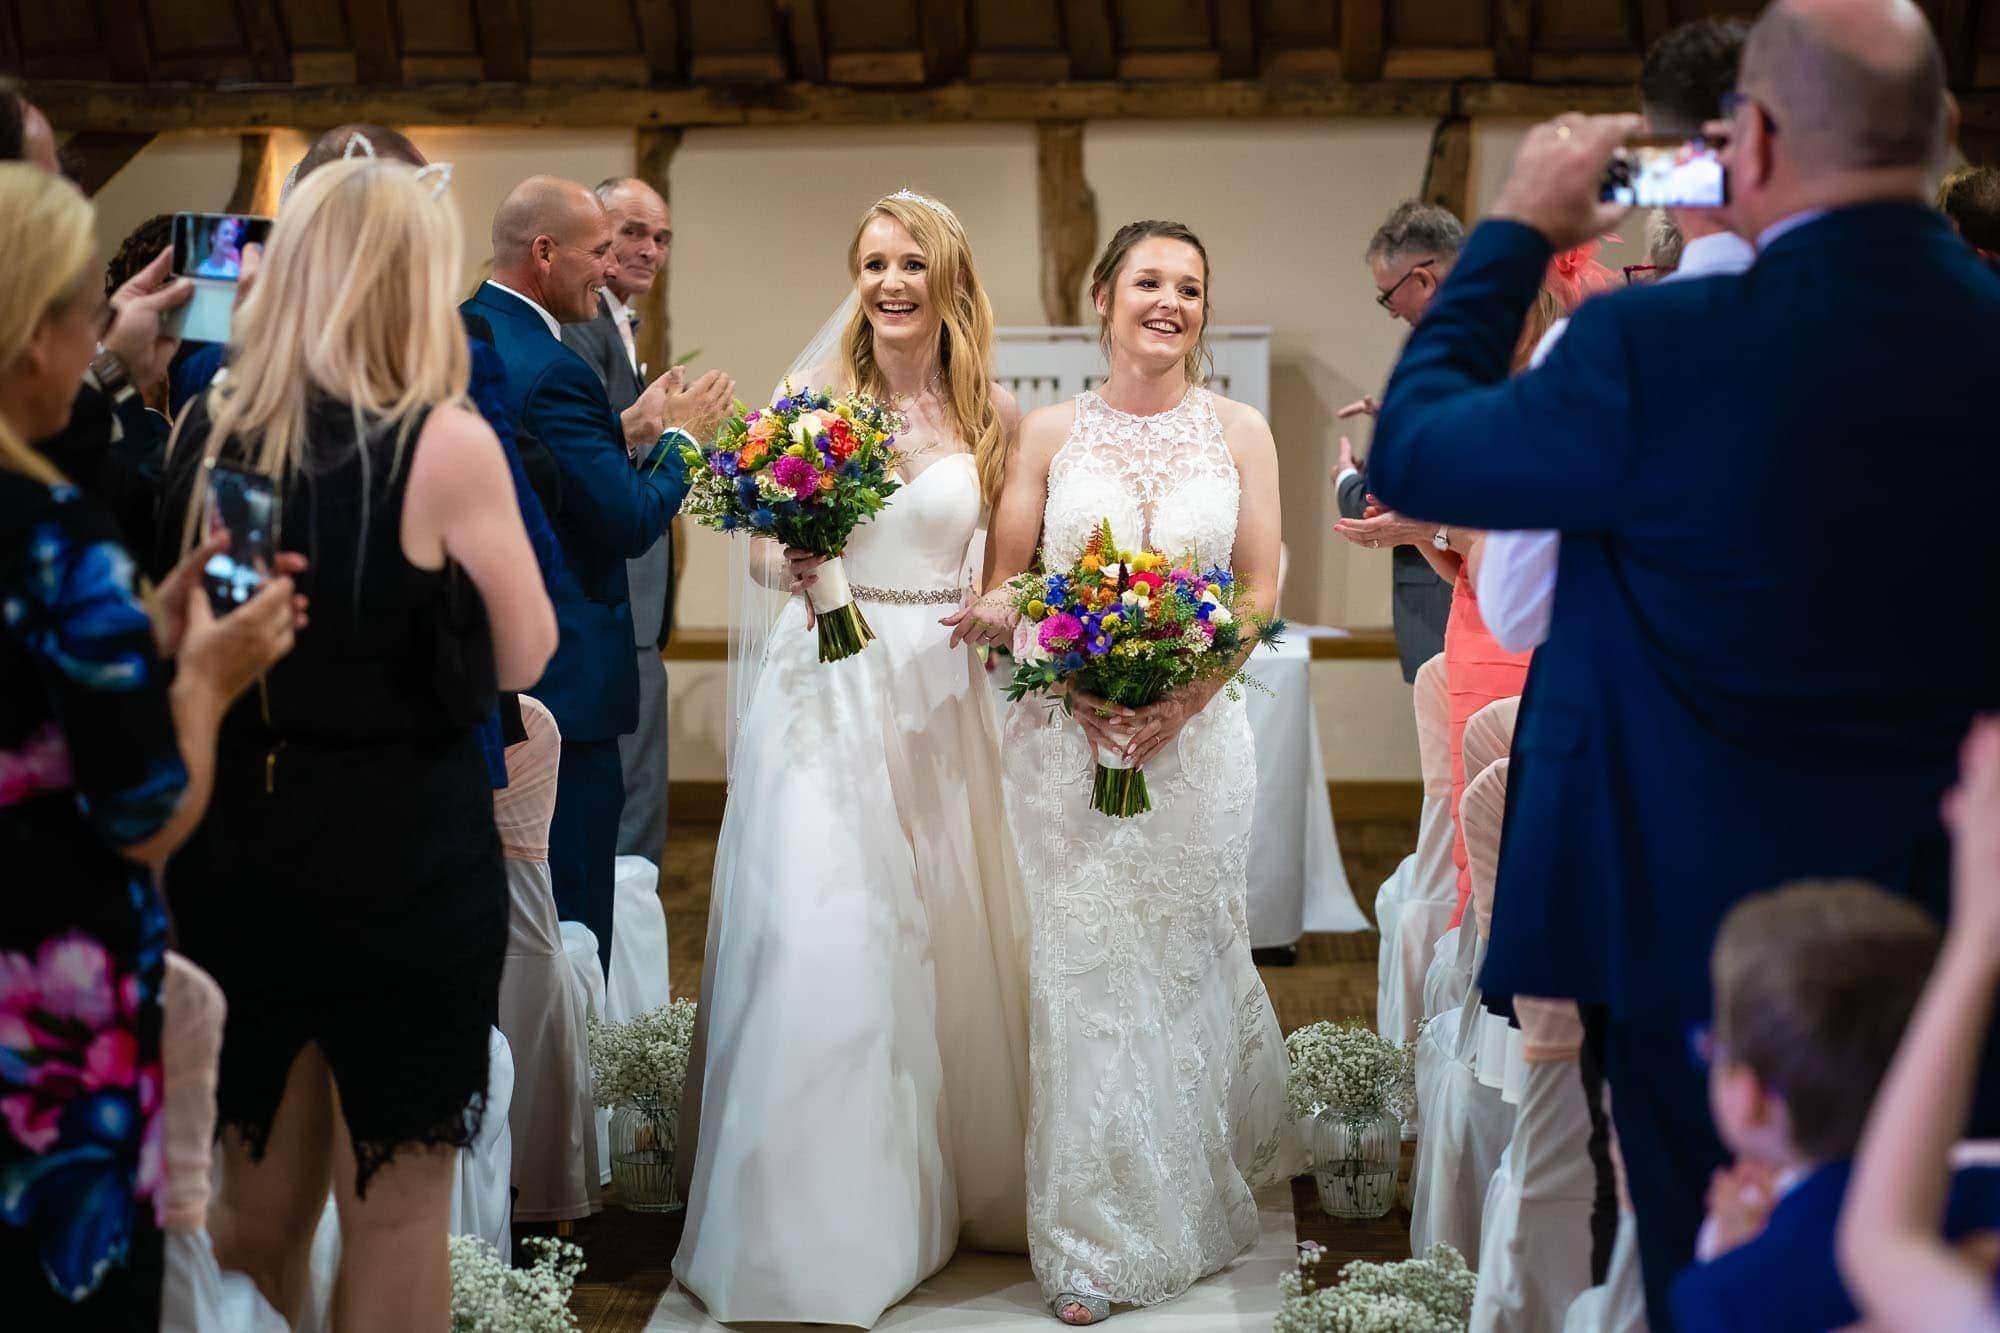 Two Brides wedding at Norton Park Hotel LBGTQ wedding